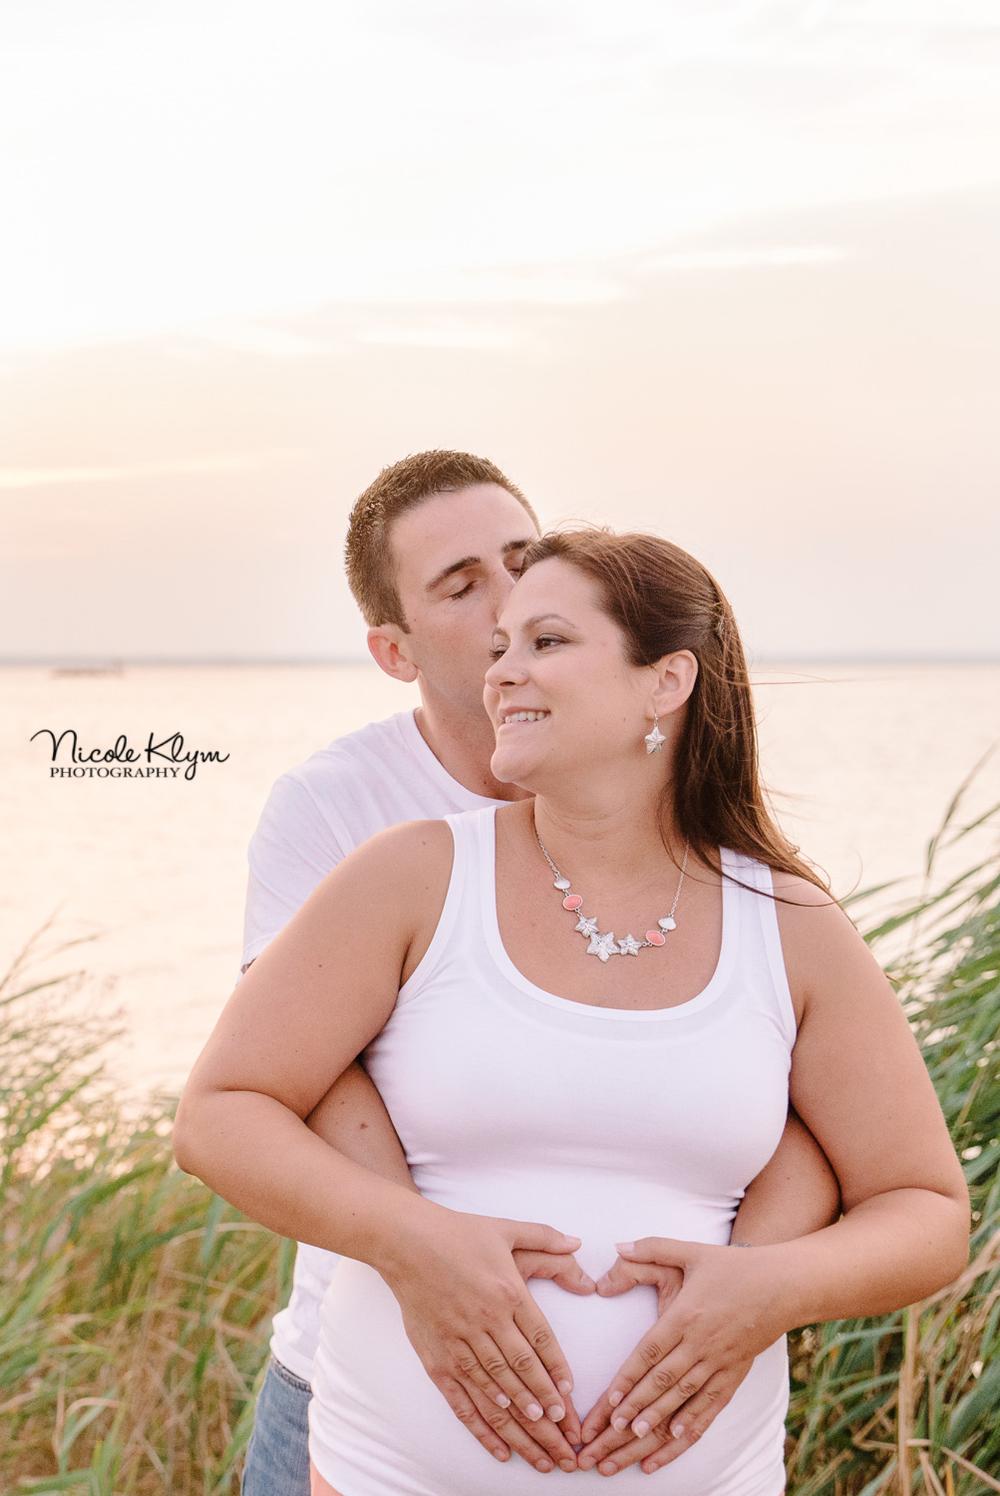 Long Beach Island Beach Maternity Photos | Nicole Klym Photography | www.nicoleklym.com